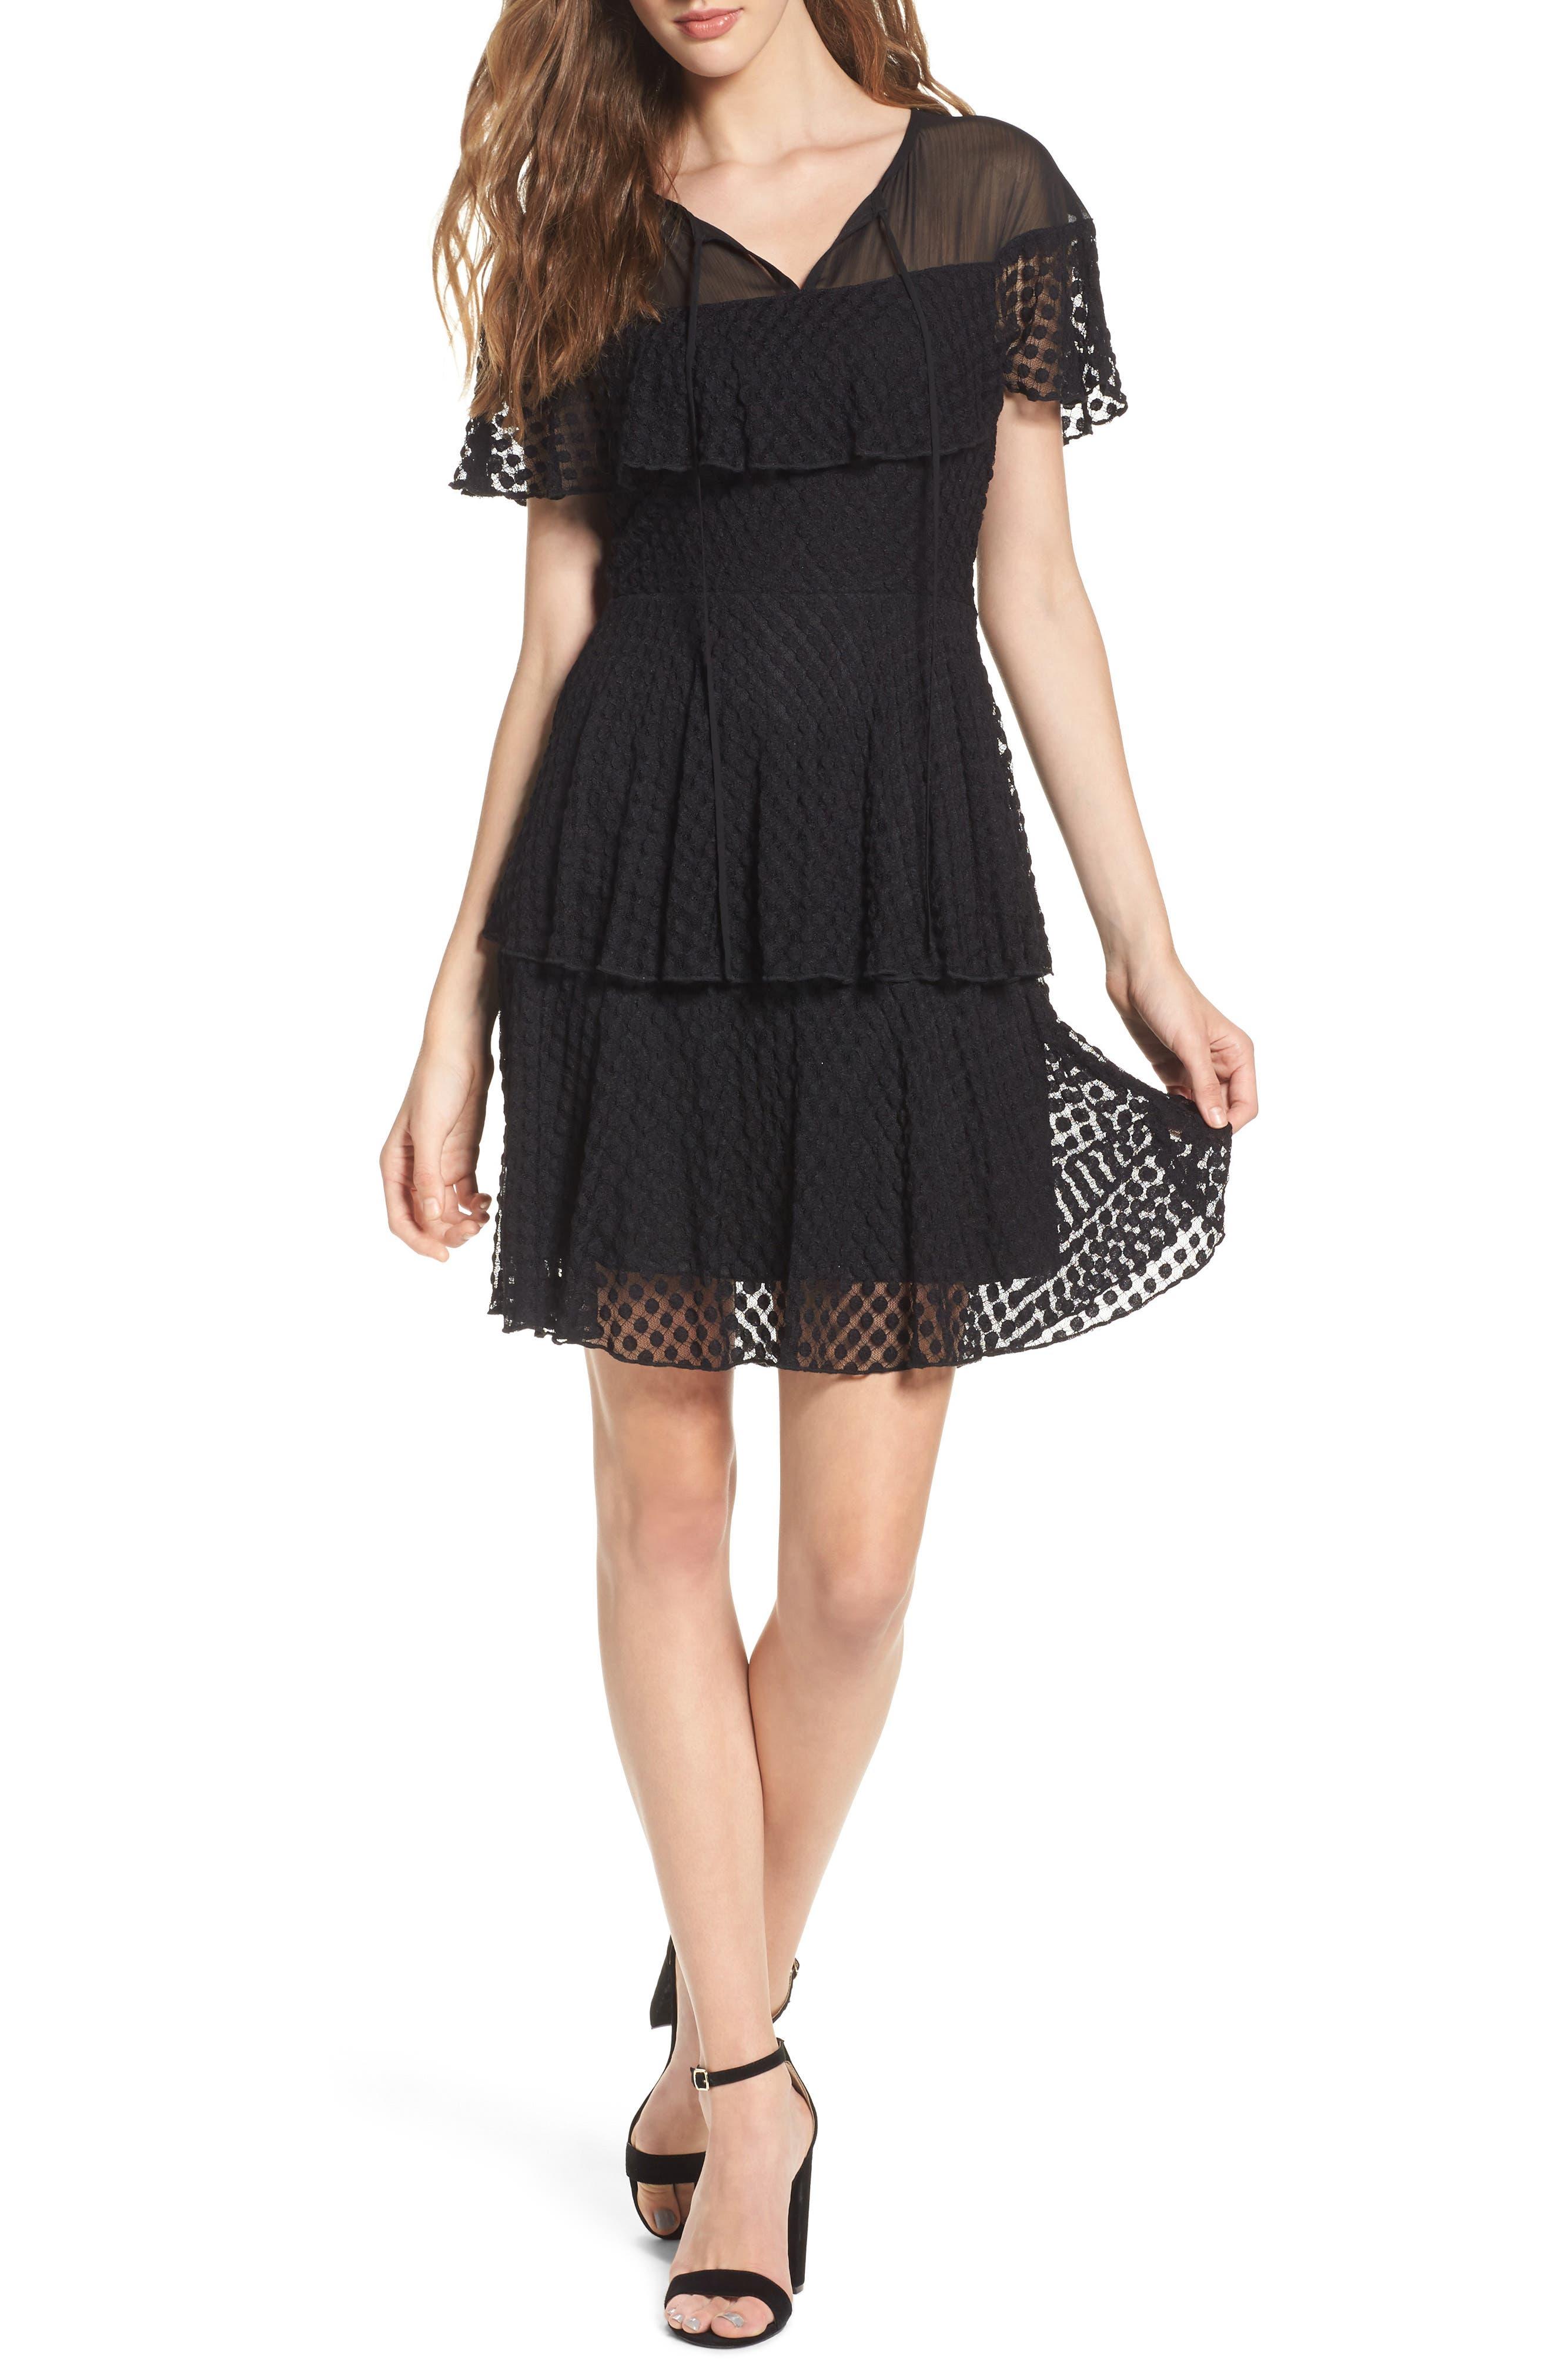 NSR Dot Lace Fit & Flare Dress